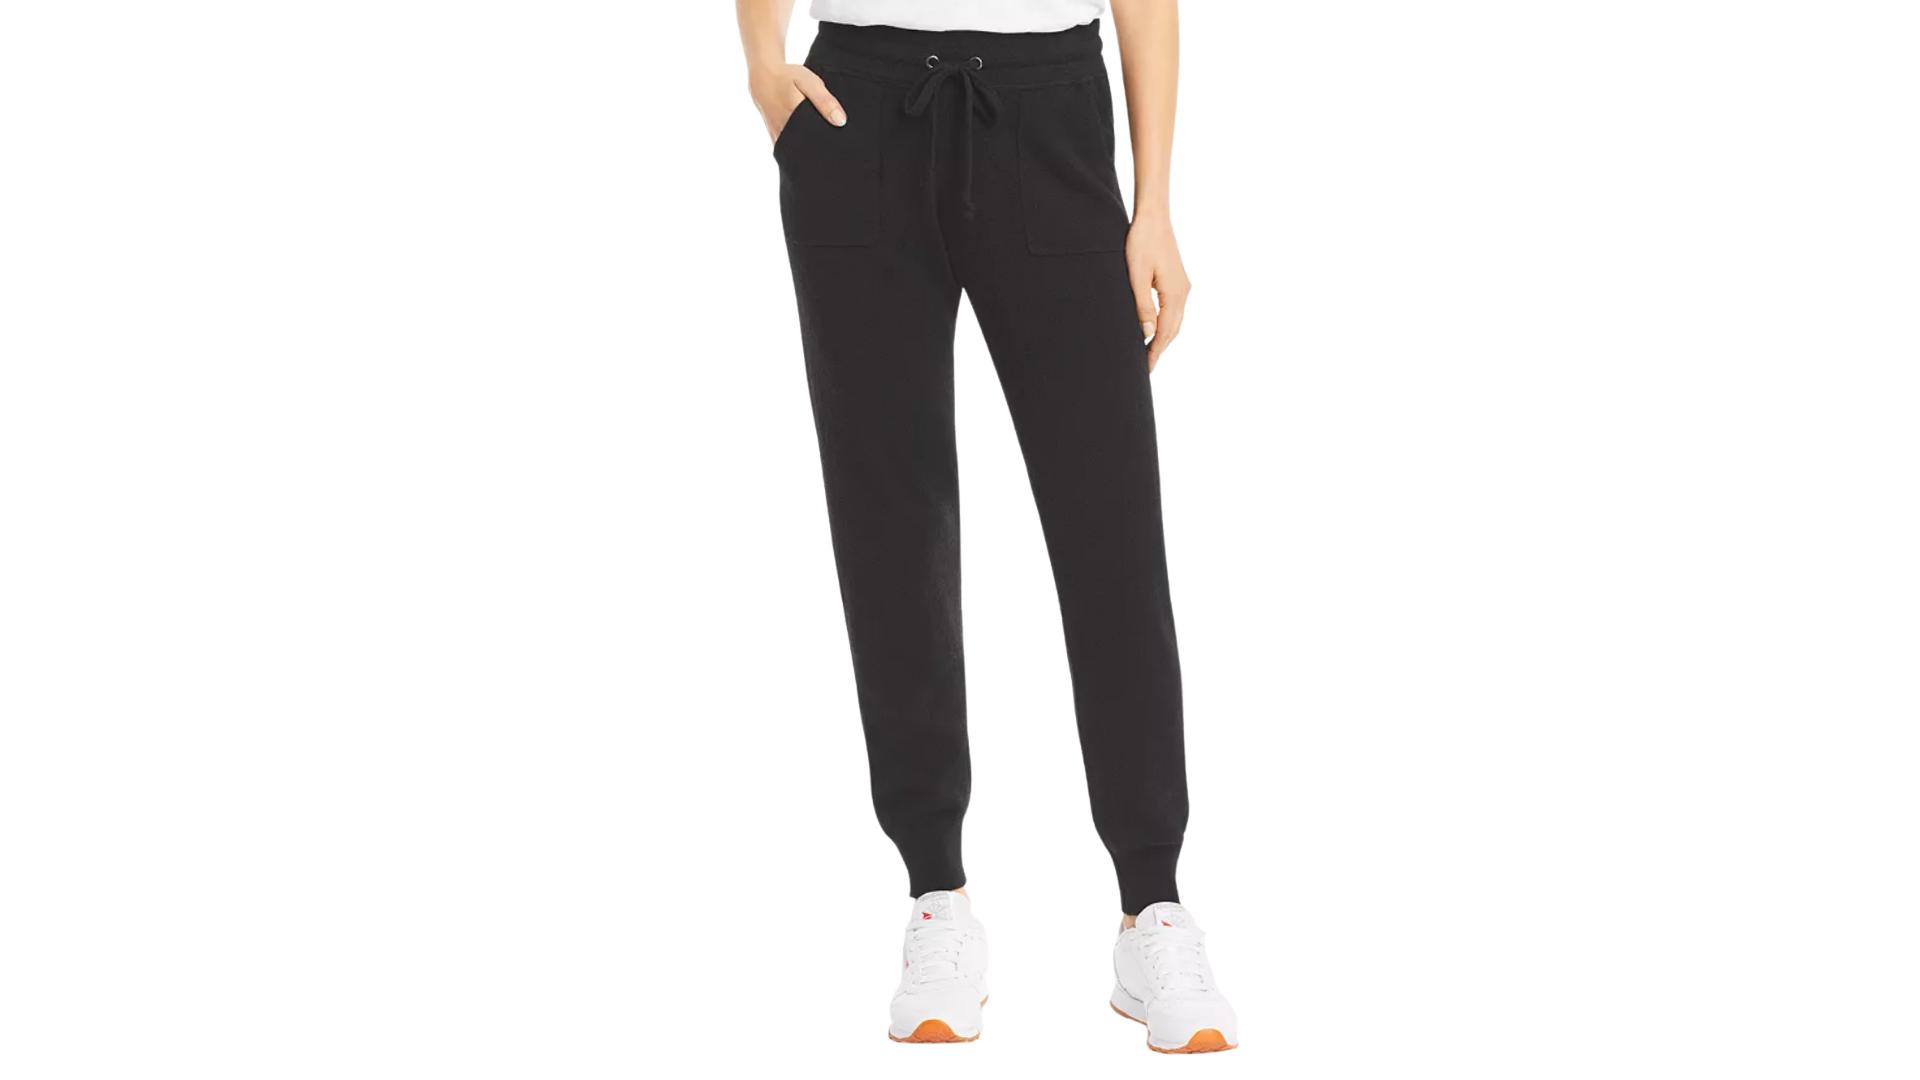 Bloomingdale's best sweatpants for women